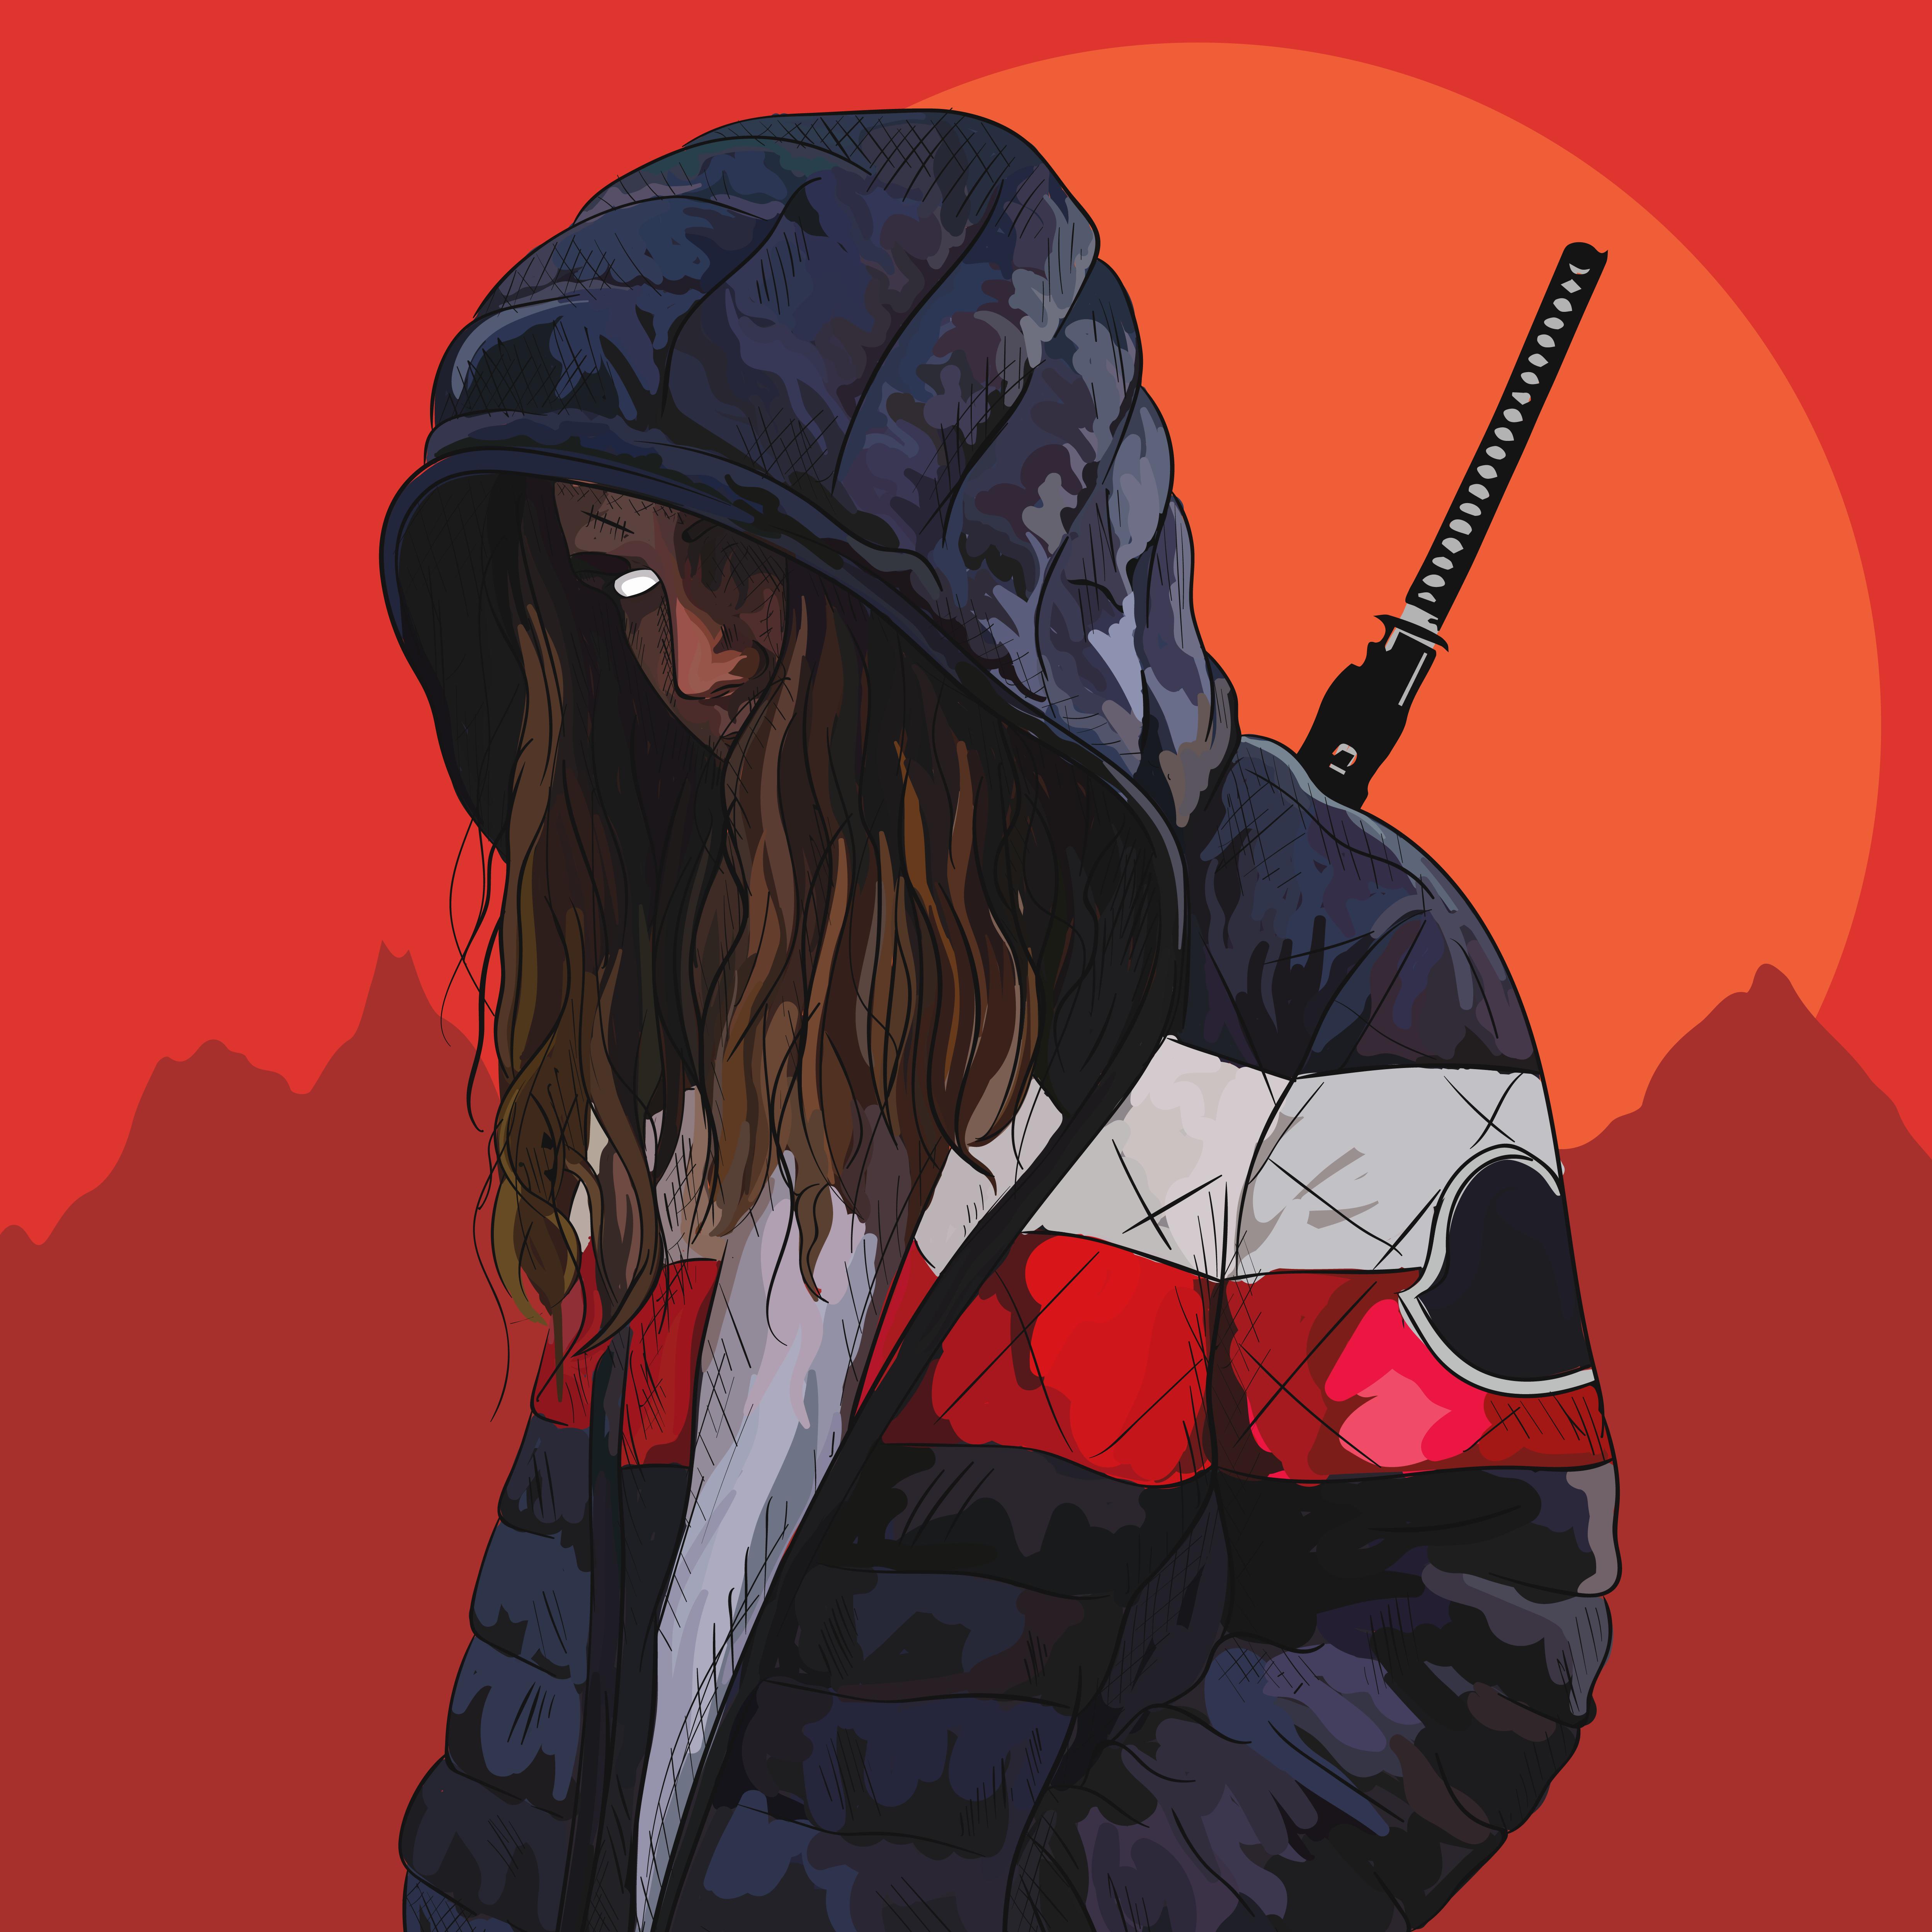 Yung Pinch Artwork 🗡 Yung pinch, Rapper art, Hip hop fashion